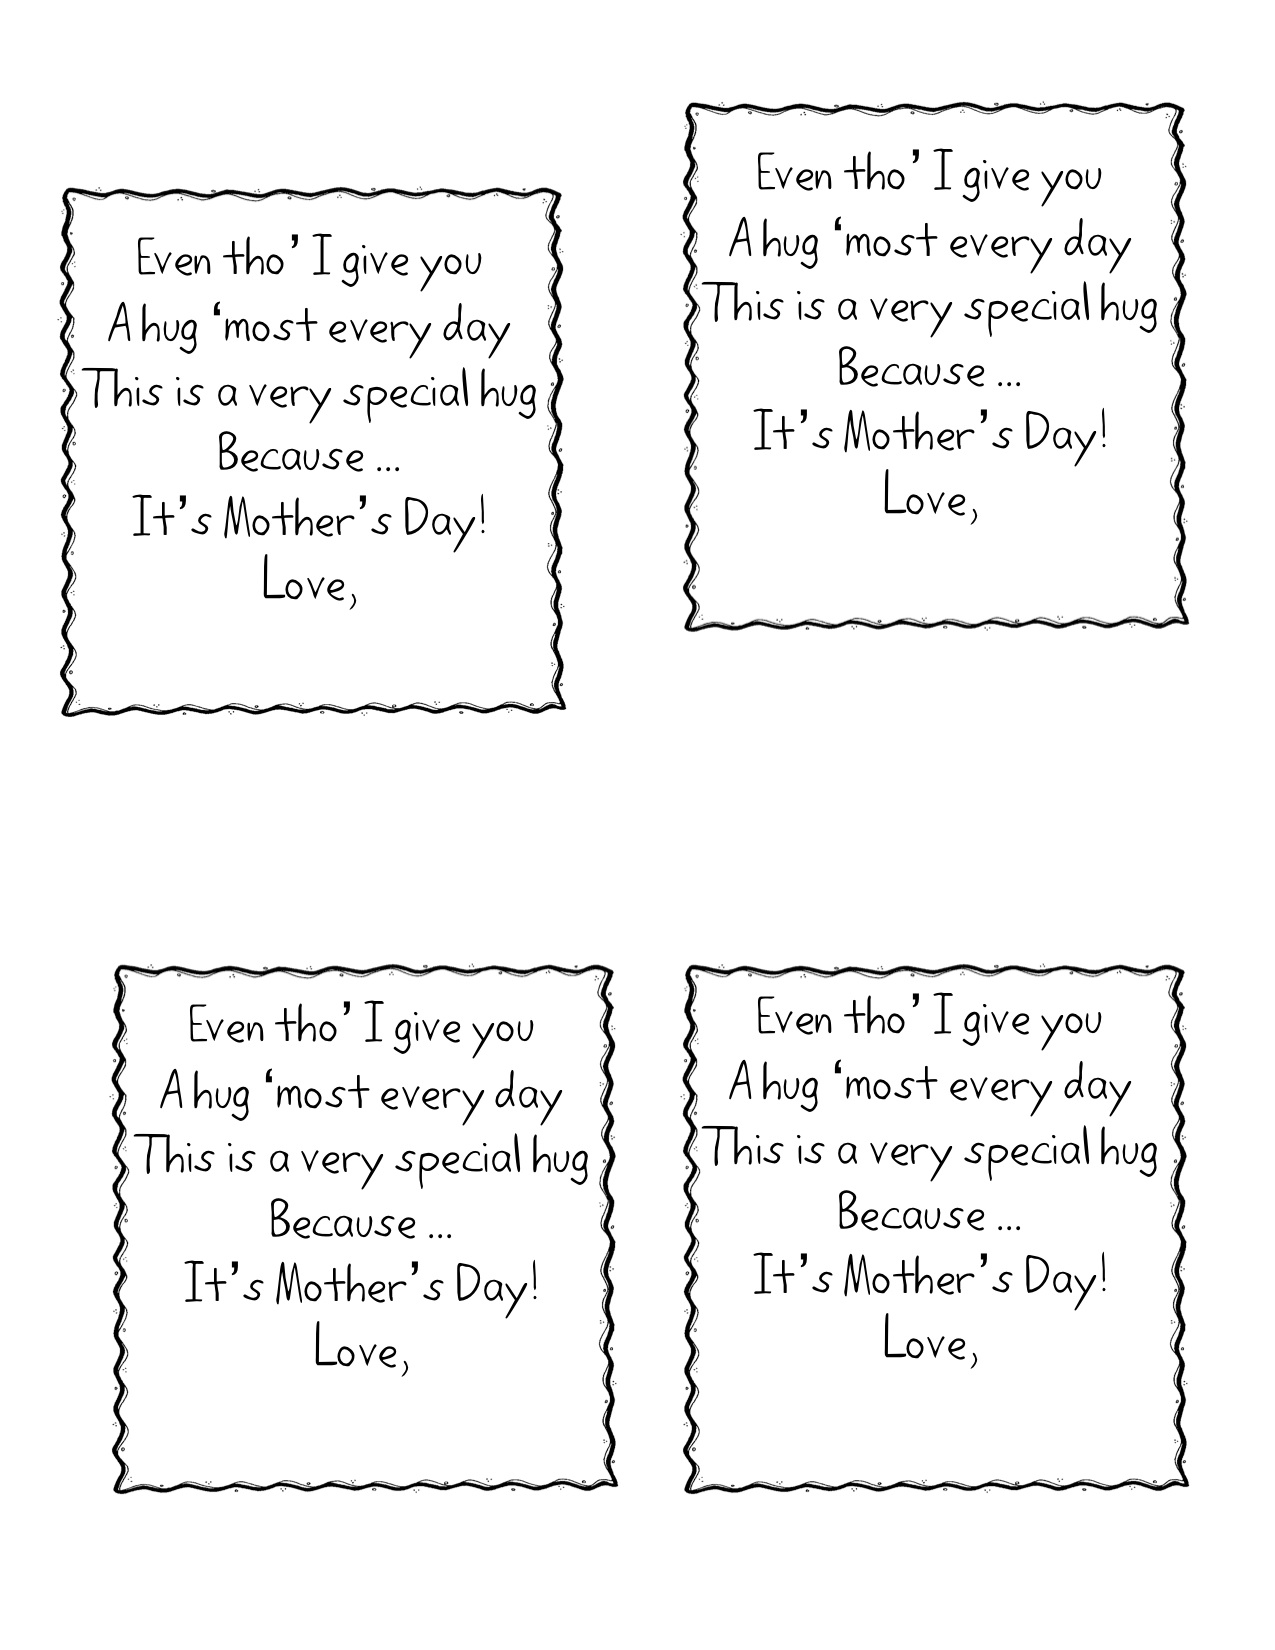 essay on the poem my papas waltz